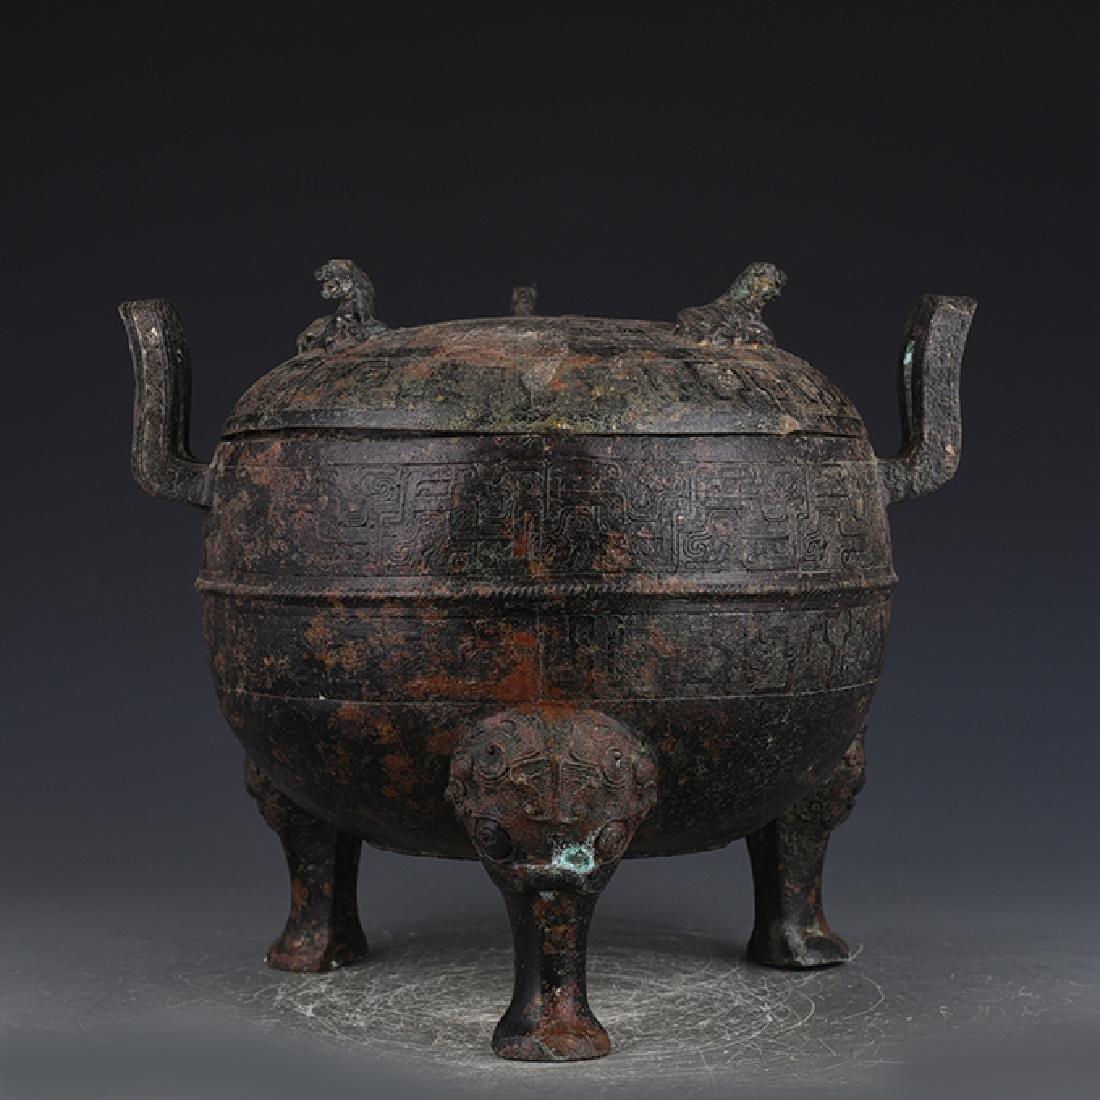 Chinese Antique Bronze Vessel